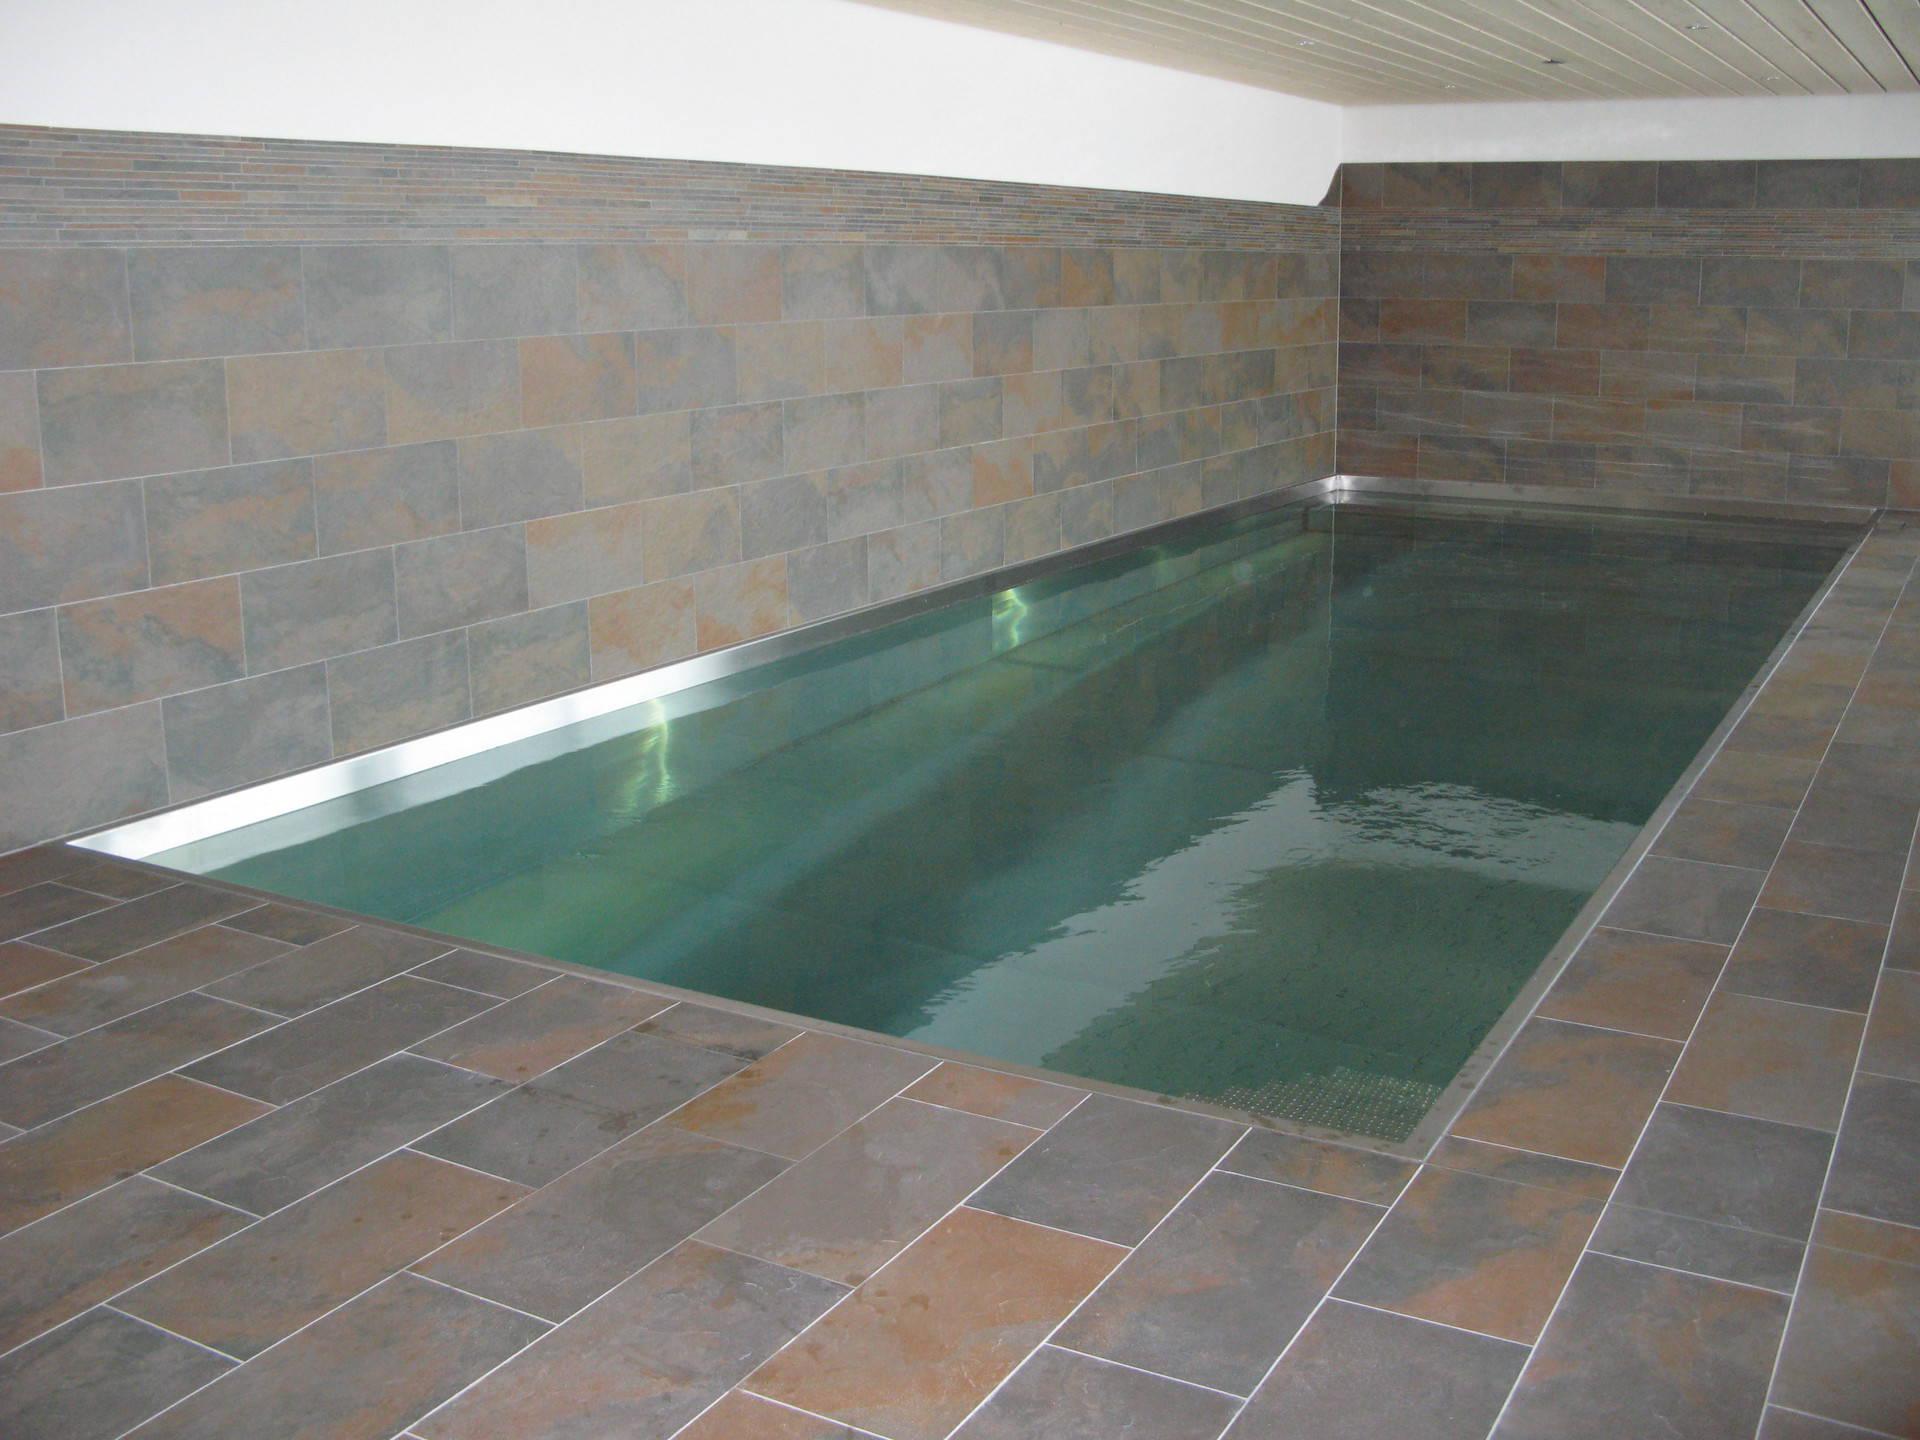 Edelstahl pools in h chster qualit t ibatec ag for Stahl pool eckig